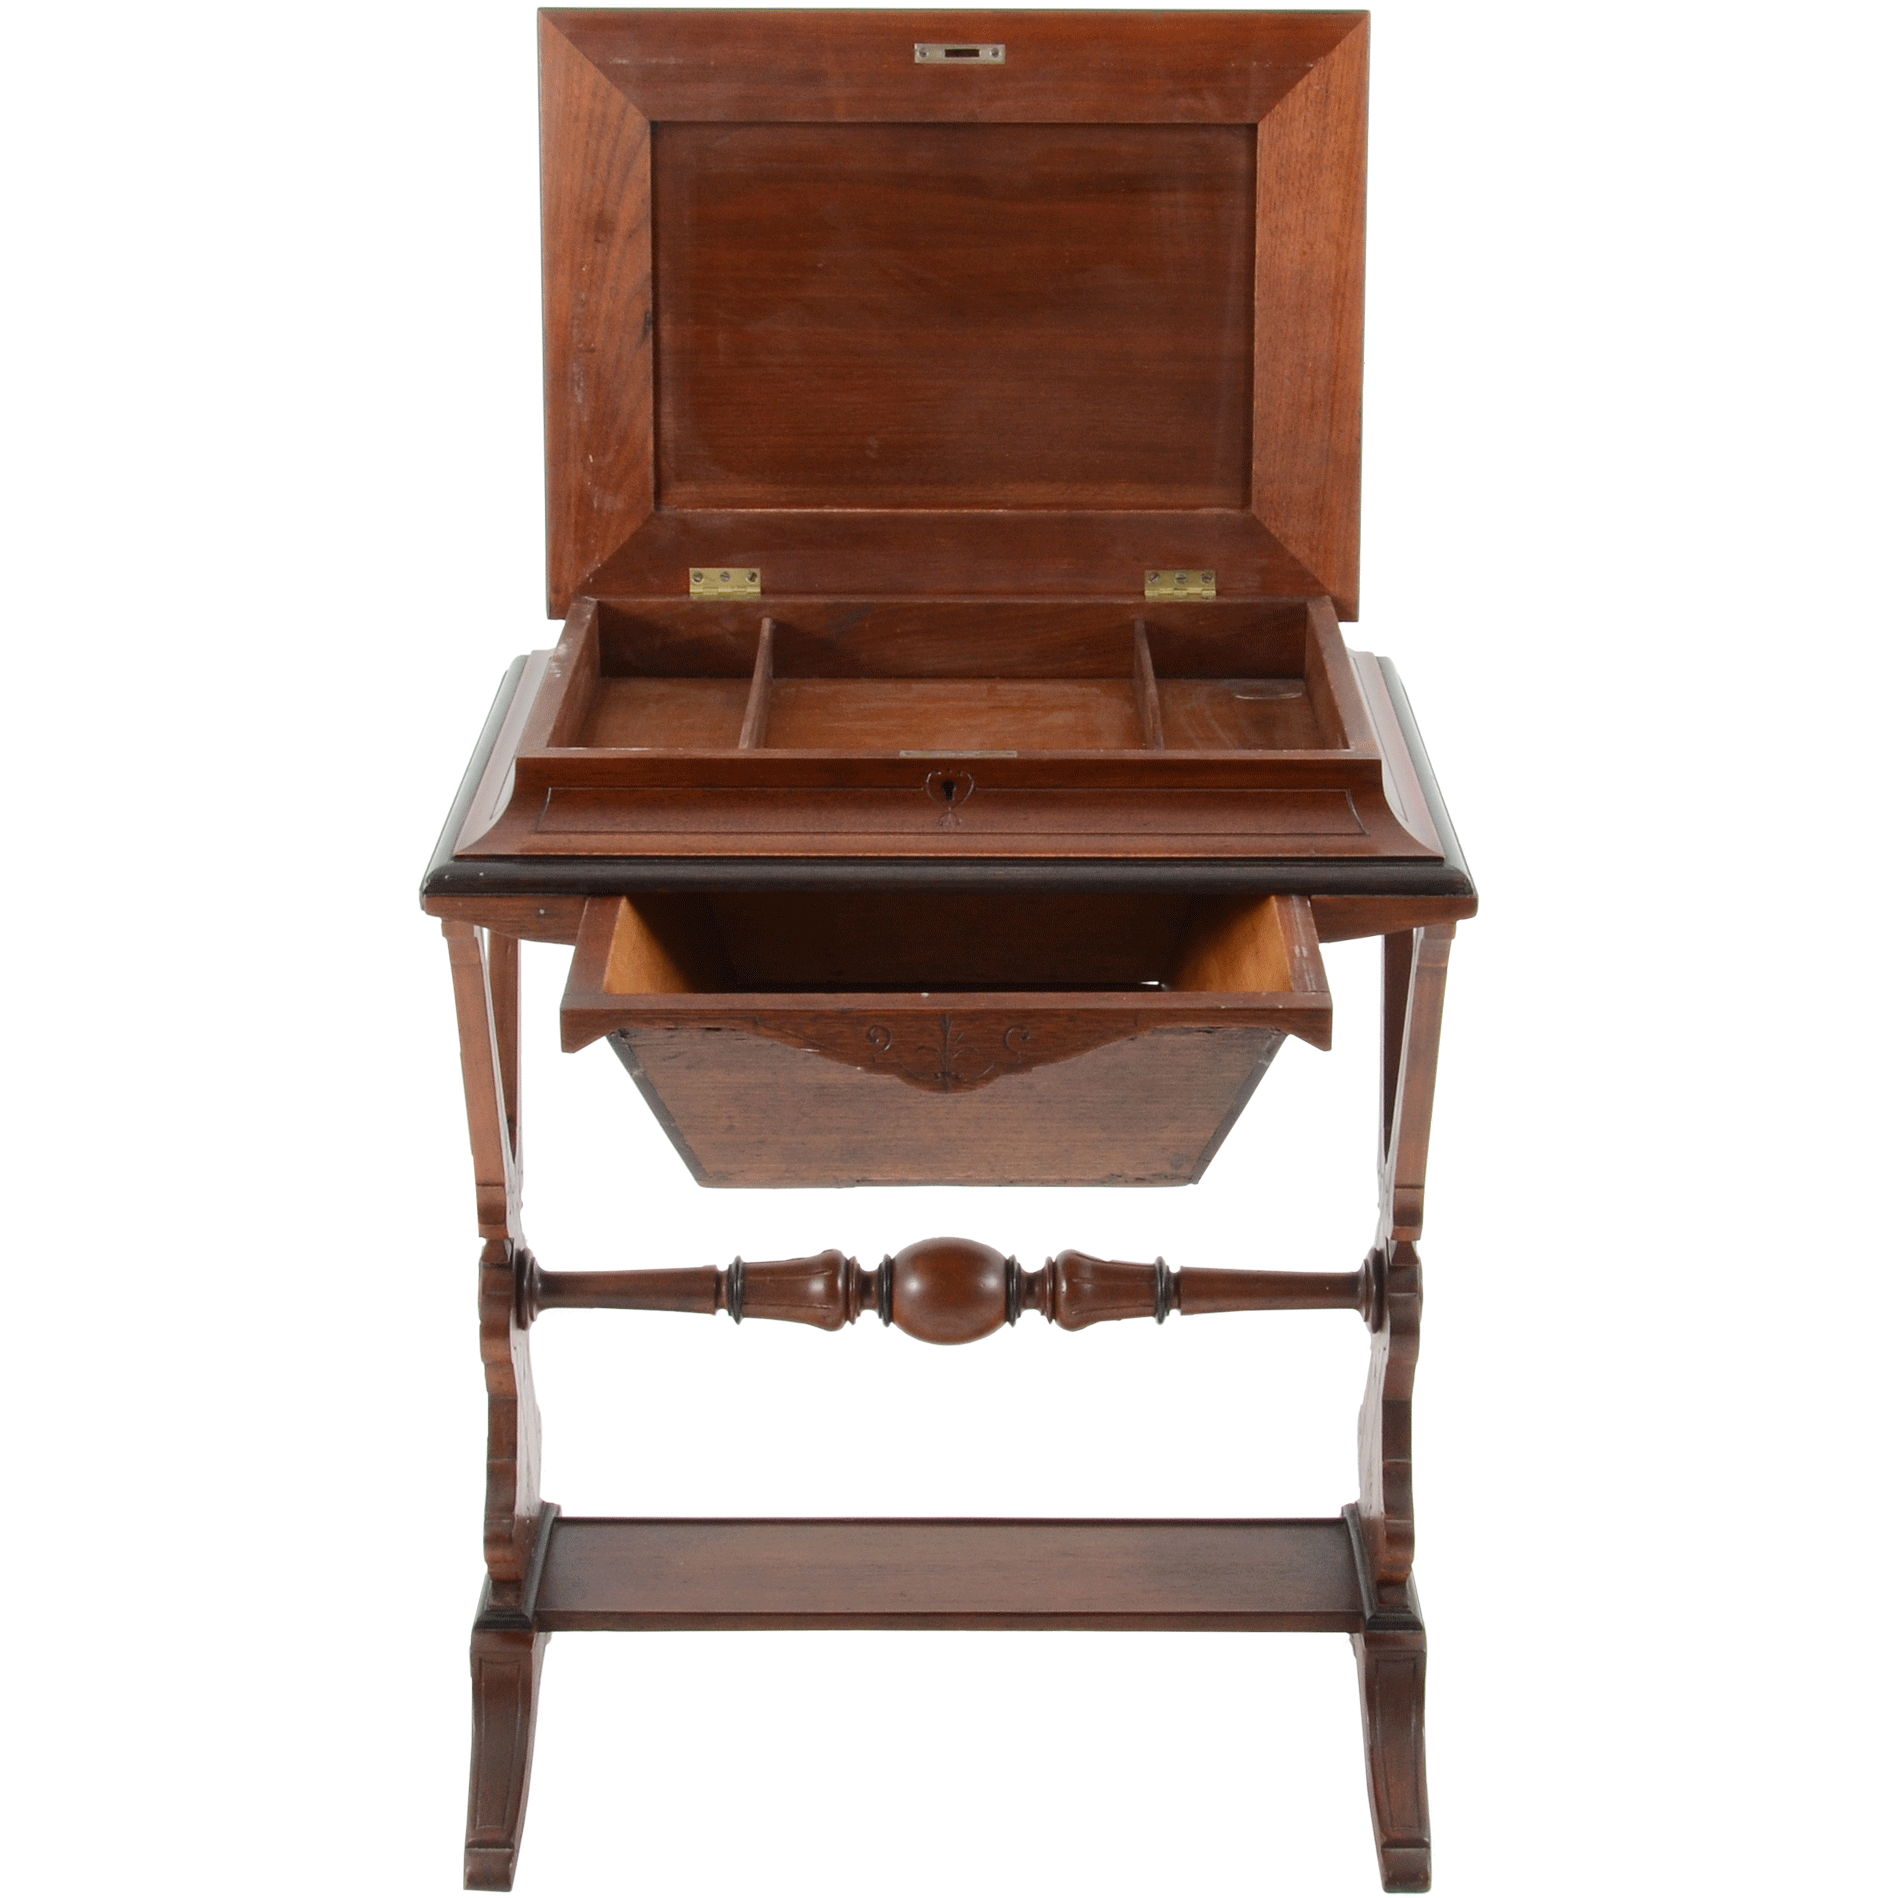 American Renaissance Revival Walnut Sewing Table